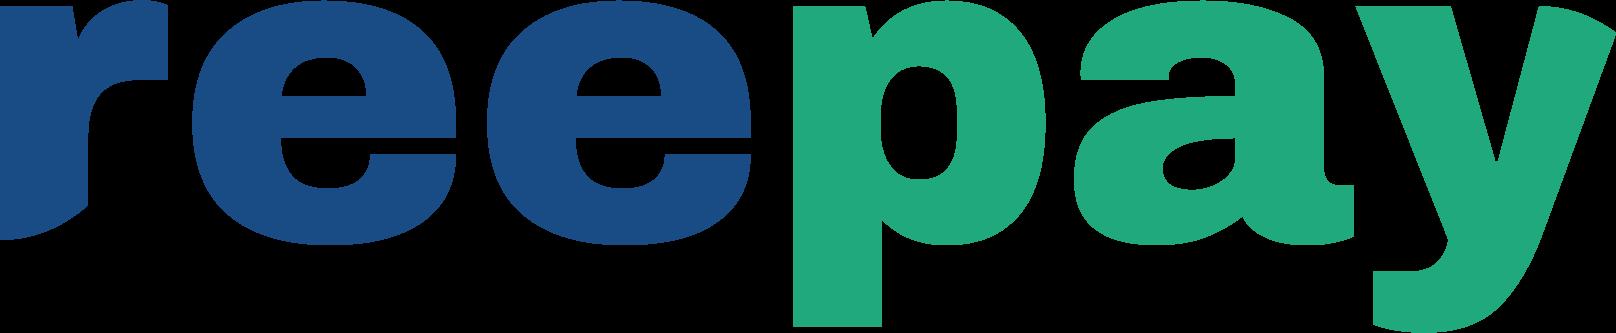 Reepay-Logo-Color kundefordele startup consulting